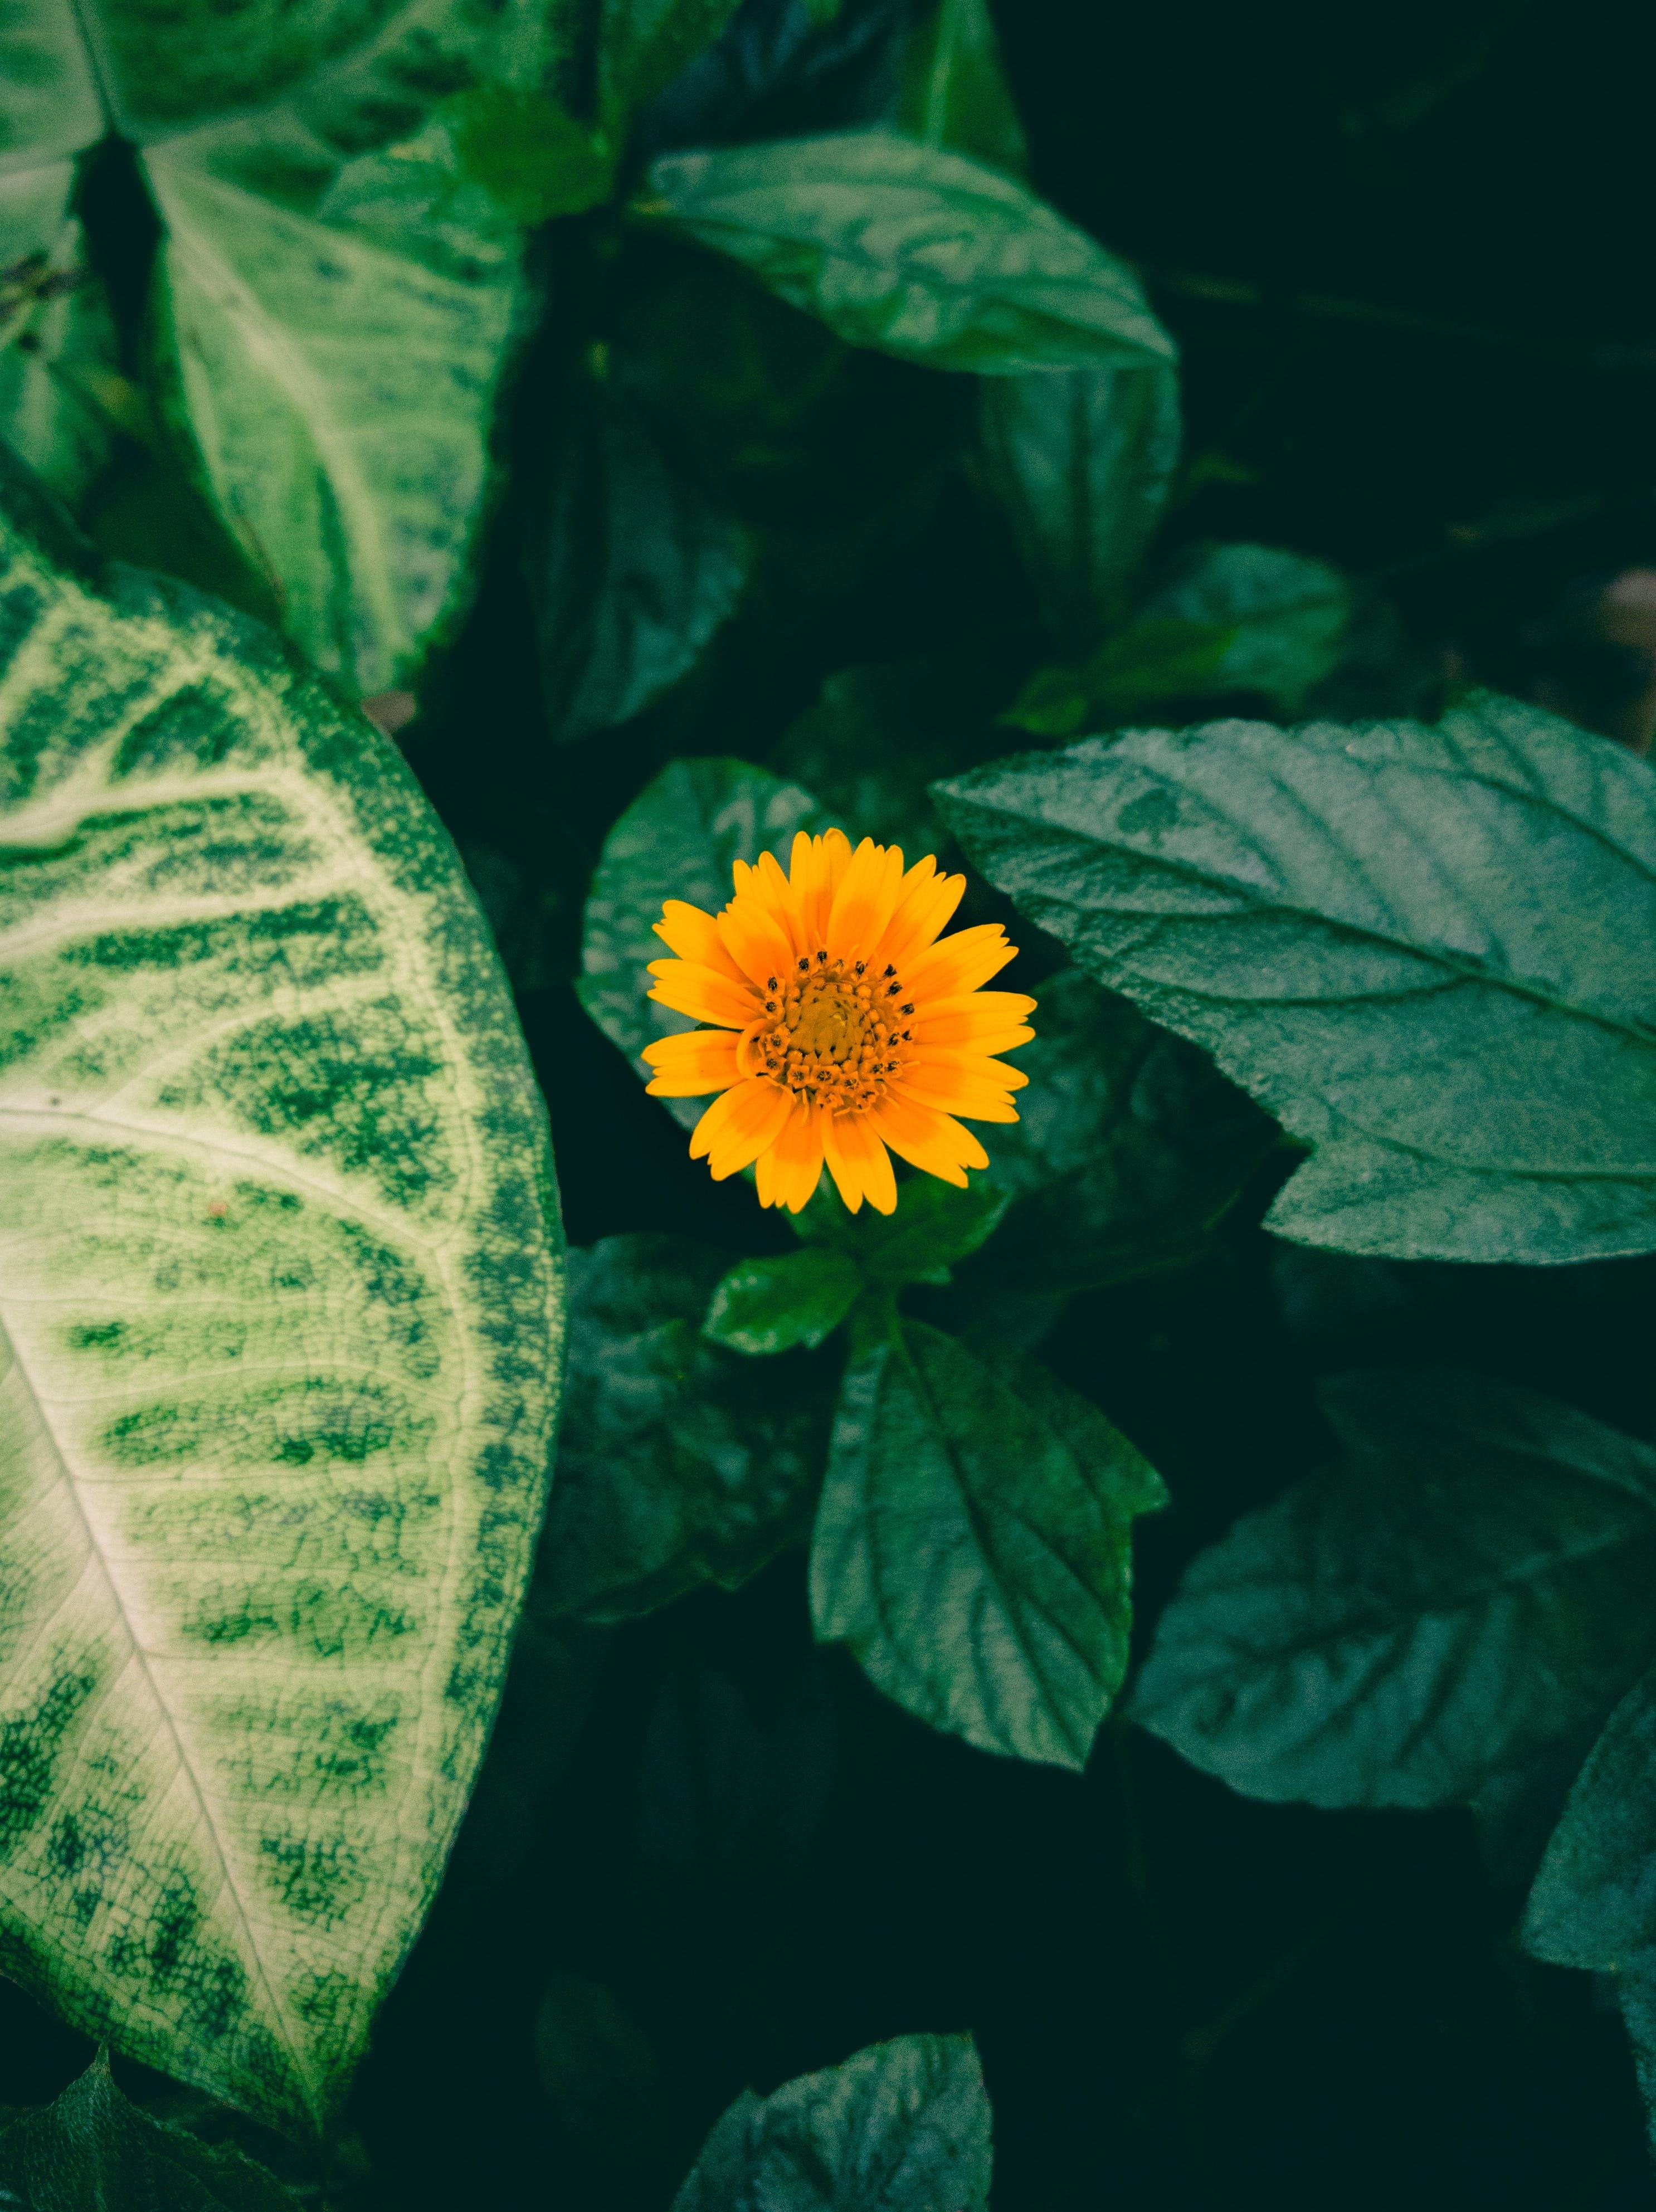 Free stock photo of flowers, yellow, flower, green